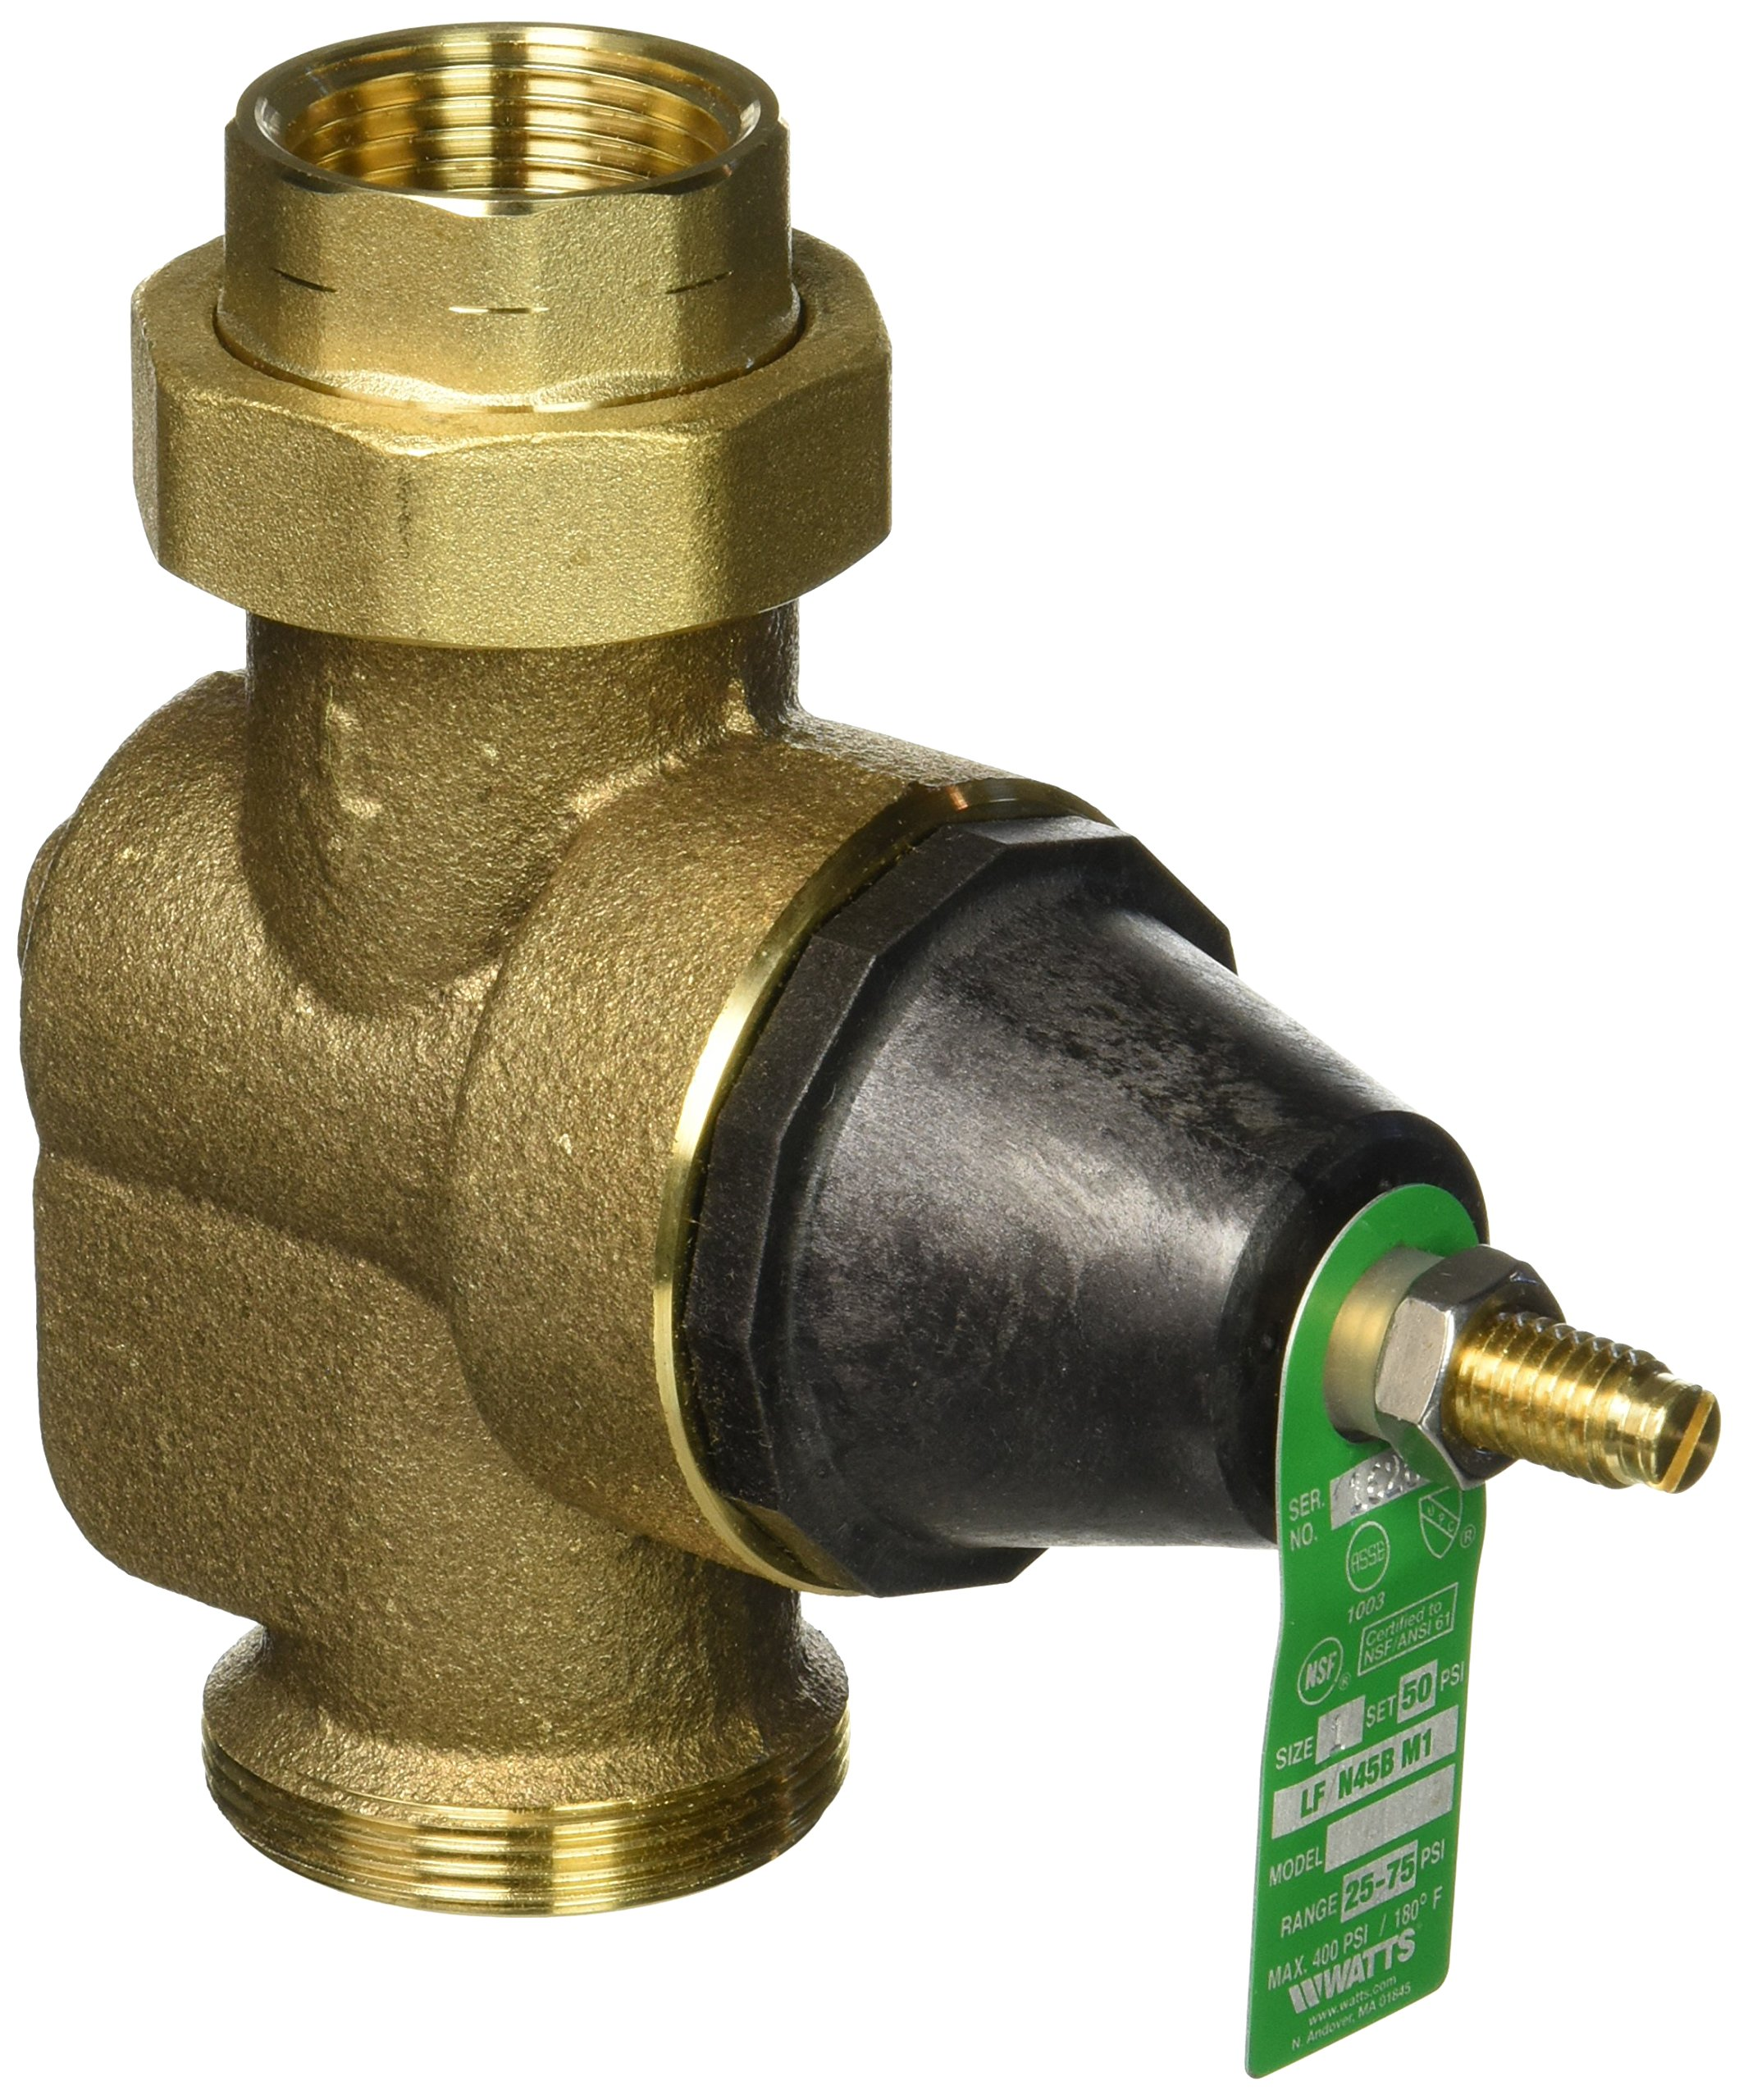 WATTS BRASS & TUBULAR 1 LFN45BM1-U 1'' Standard Capacity Lead Free Water Pressure Reducing Valve